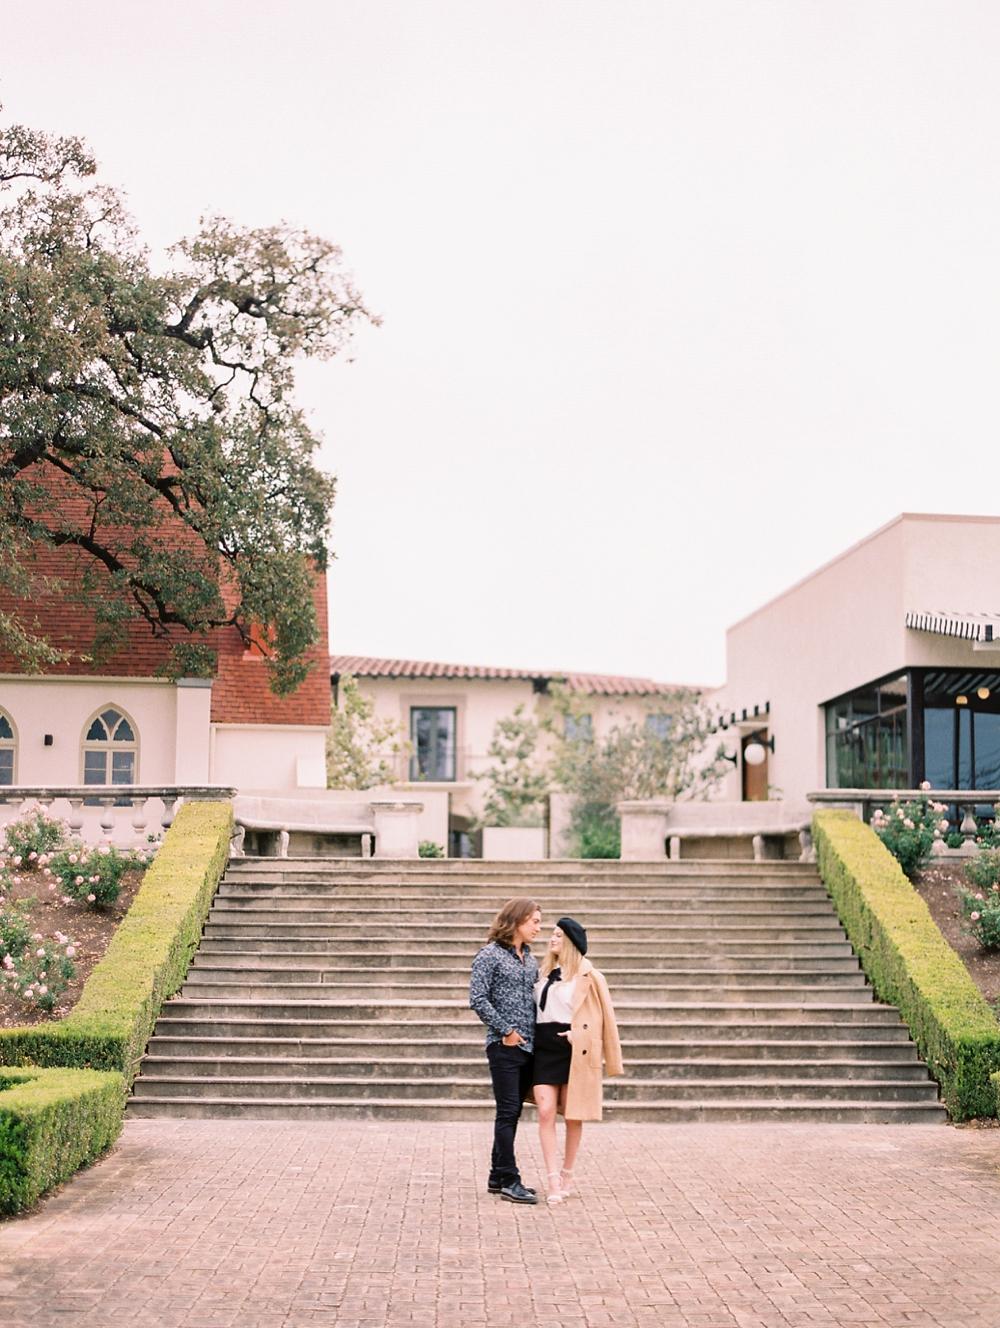 kristin-la-voie-photography-Austin-Wedding-Boudoir-Photographer-Commodore-Perry-Estate-20